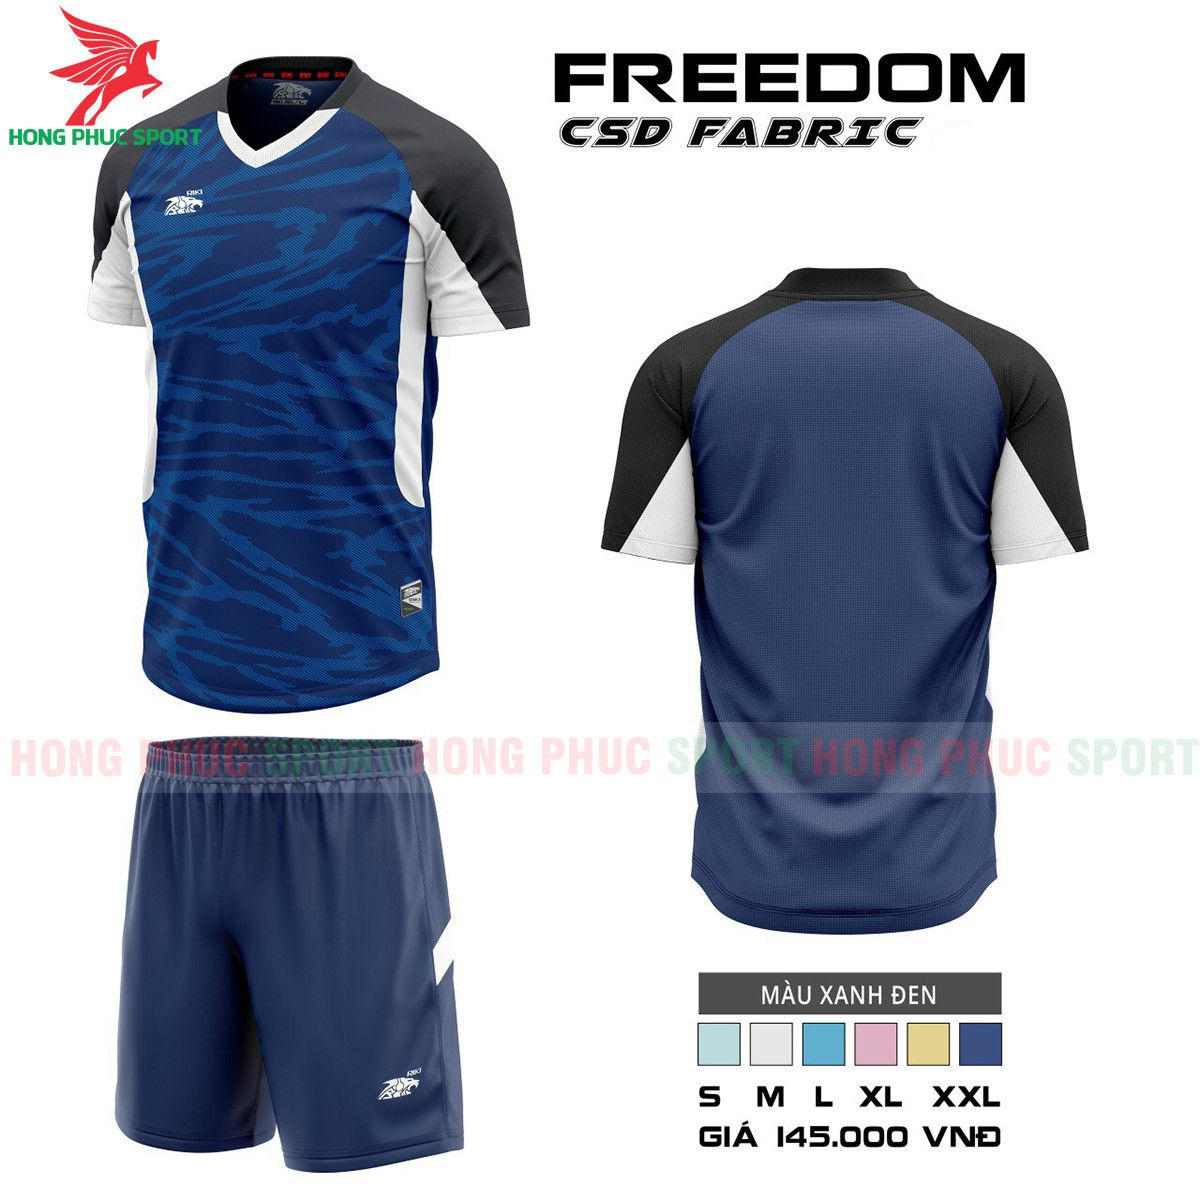 https://cdn.hongphucsport.com/unsafe/s4.shopbay.vn/files/285/ao-khong-logo-riki-freedom-2021-mau-xanh-den-1-6156830ecb721.jpg